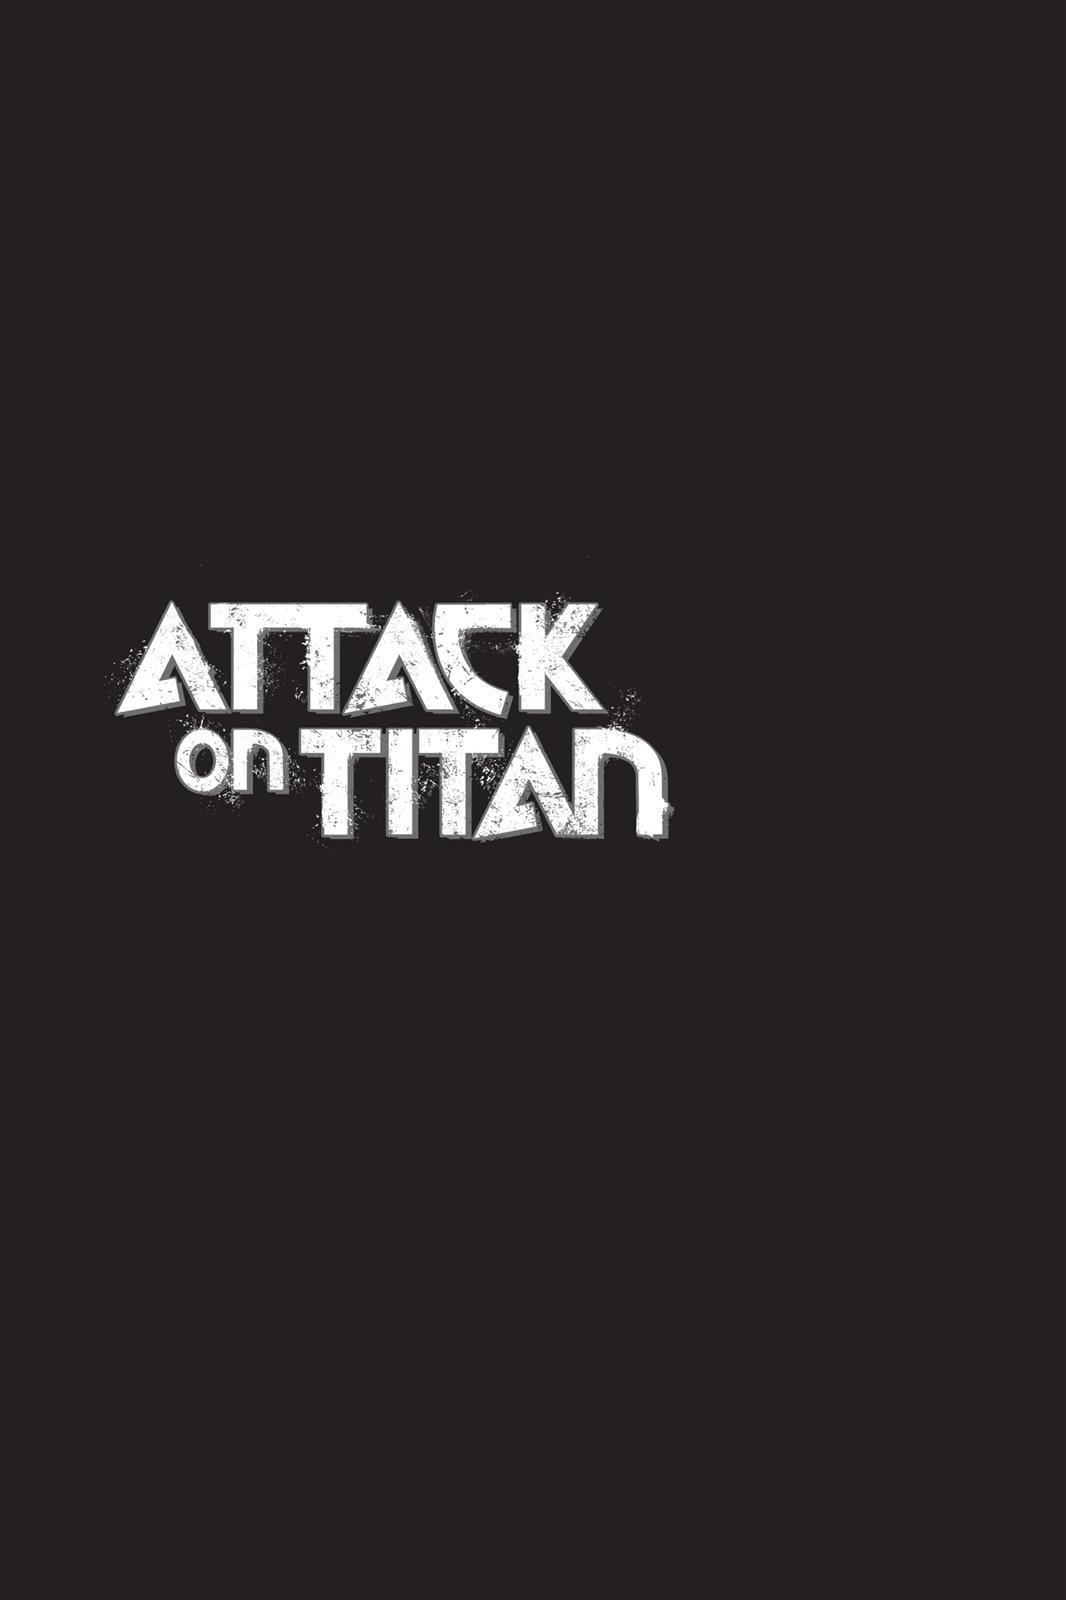 Attack On Titan, Episode 8 image 036